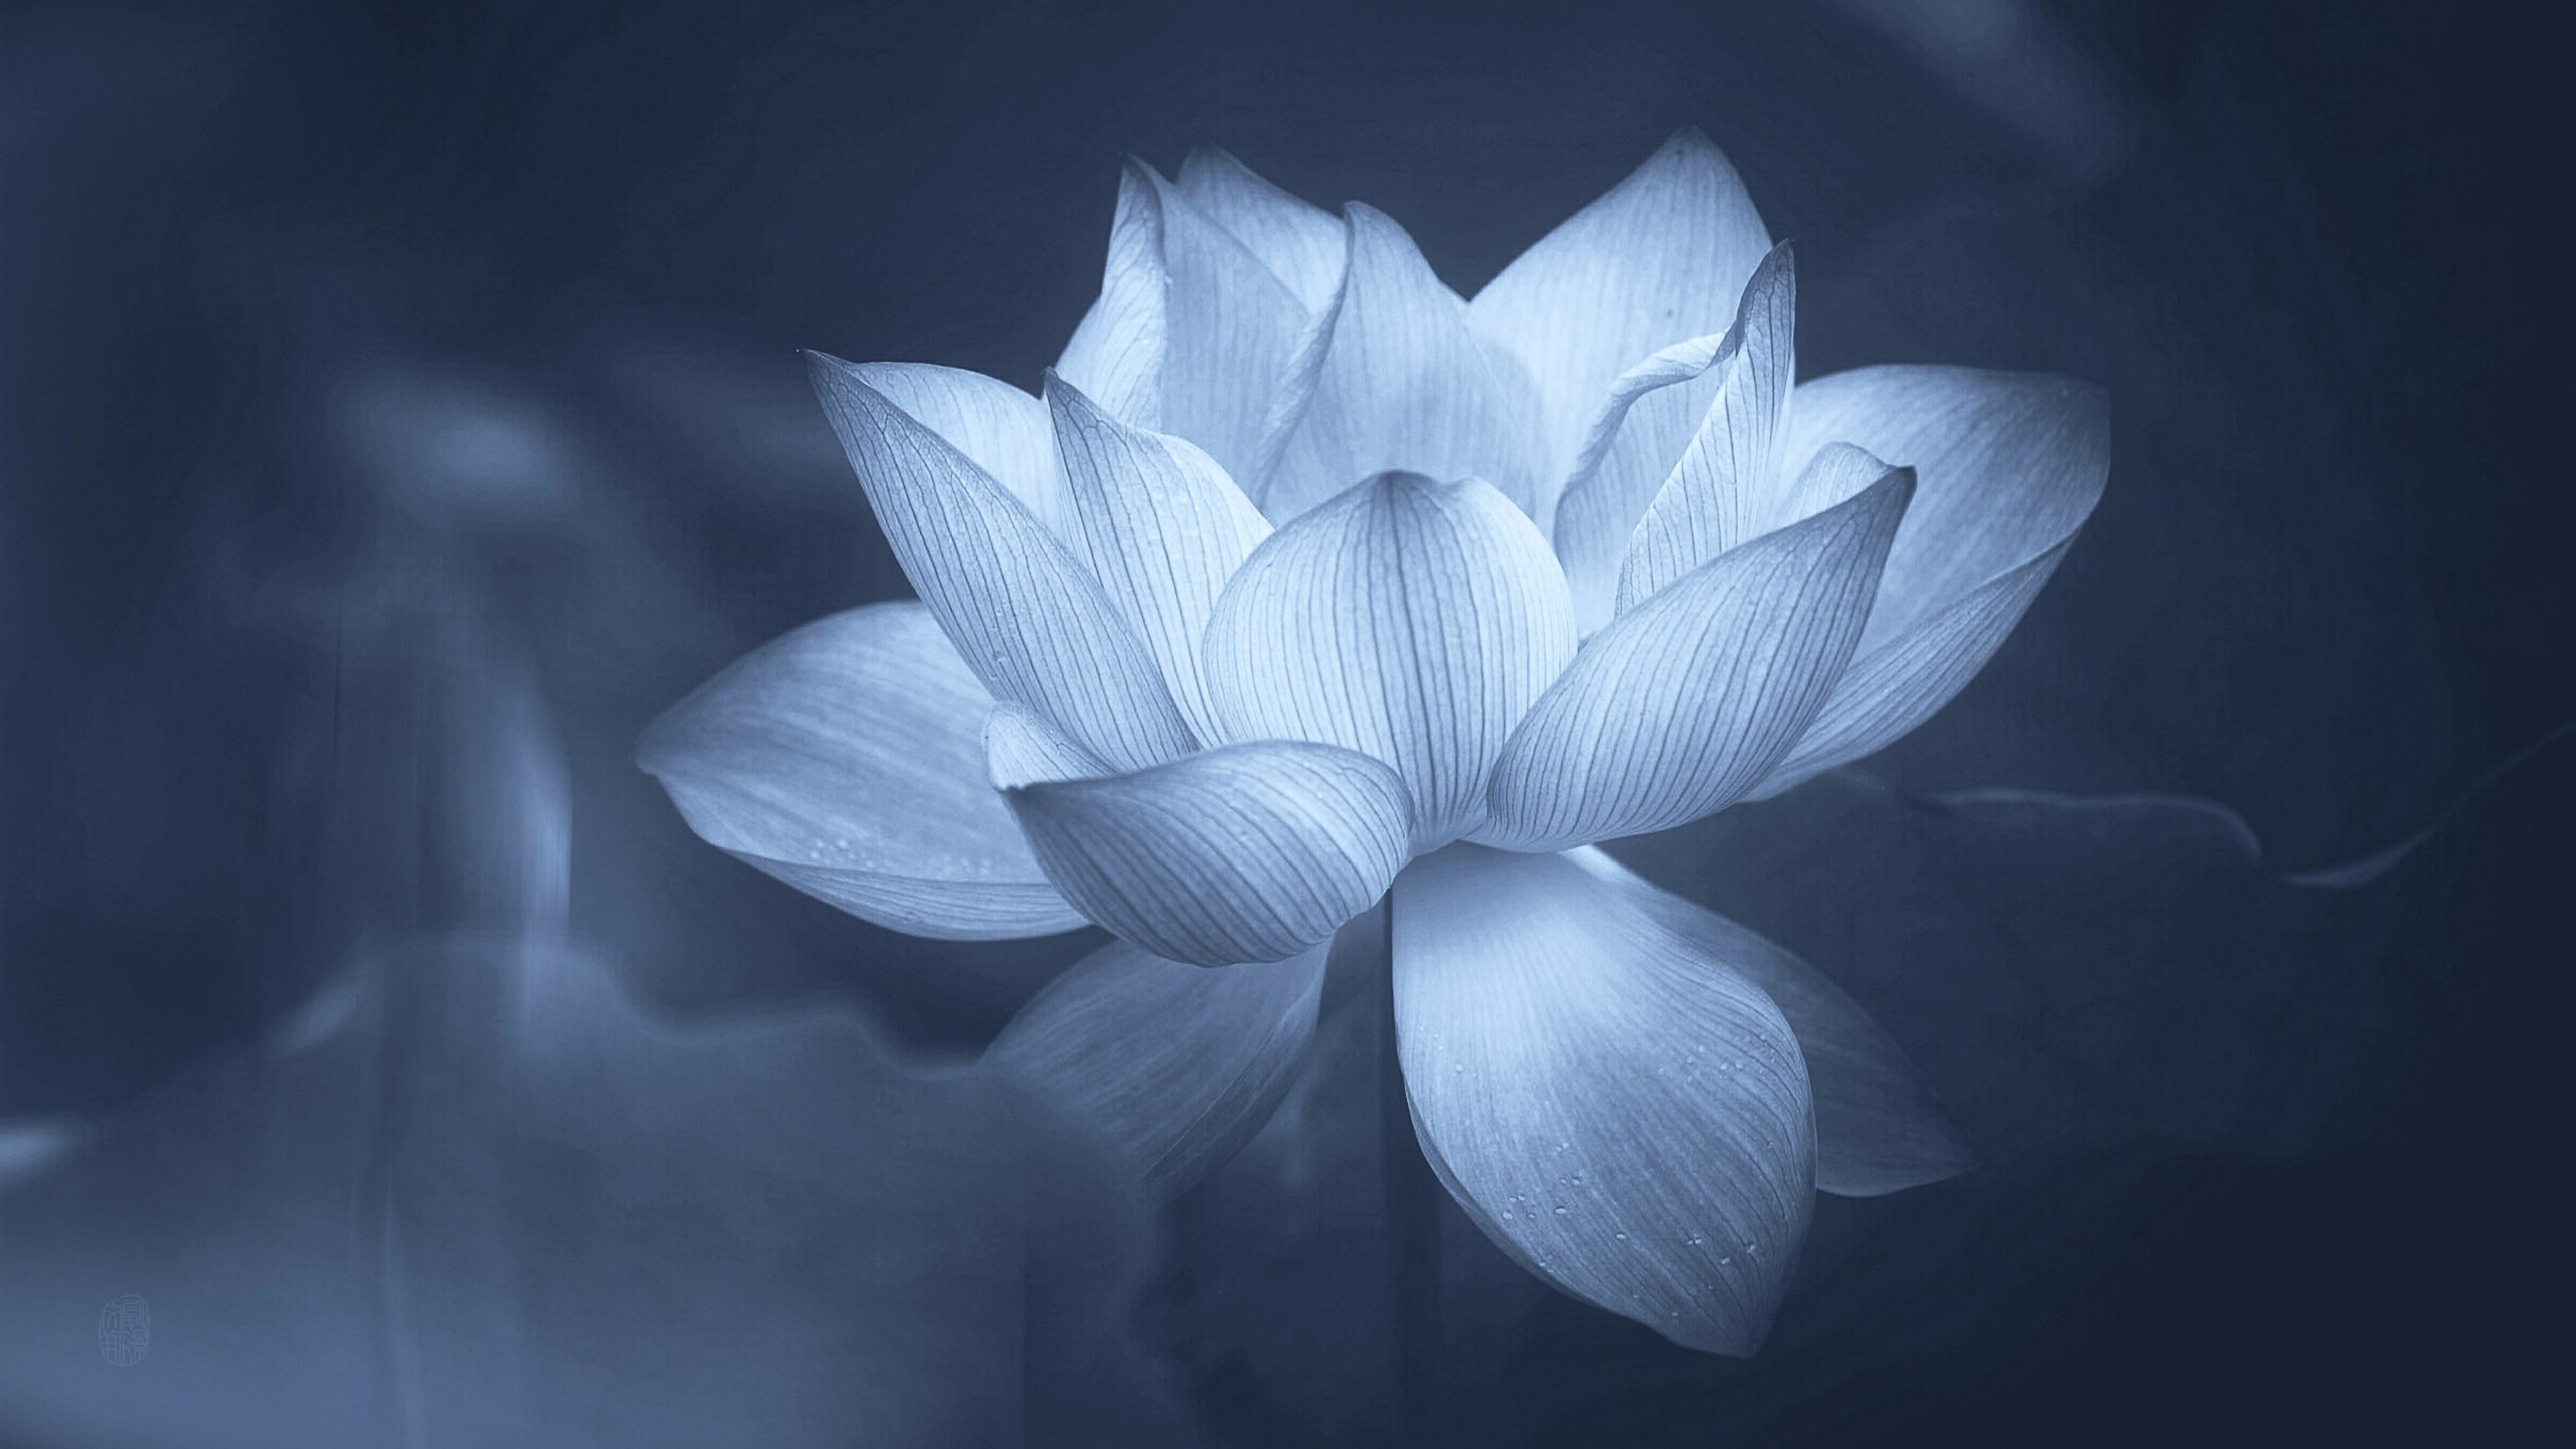 Iphone Wallpaper Lotus Flower Water Lotus Flower - Lotus , HD Wallpaper & Backgrounds